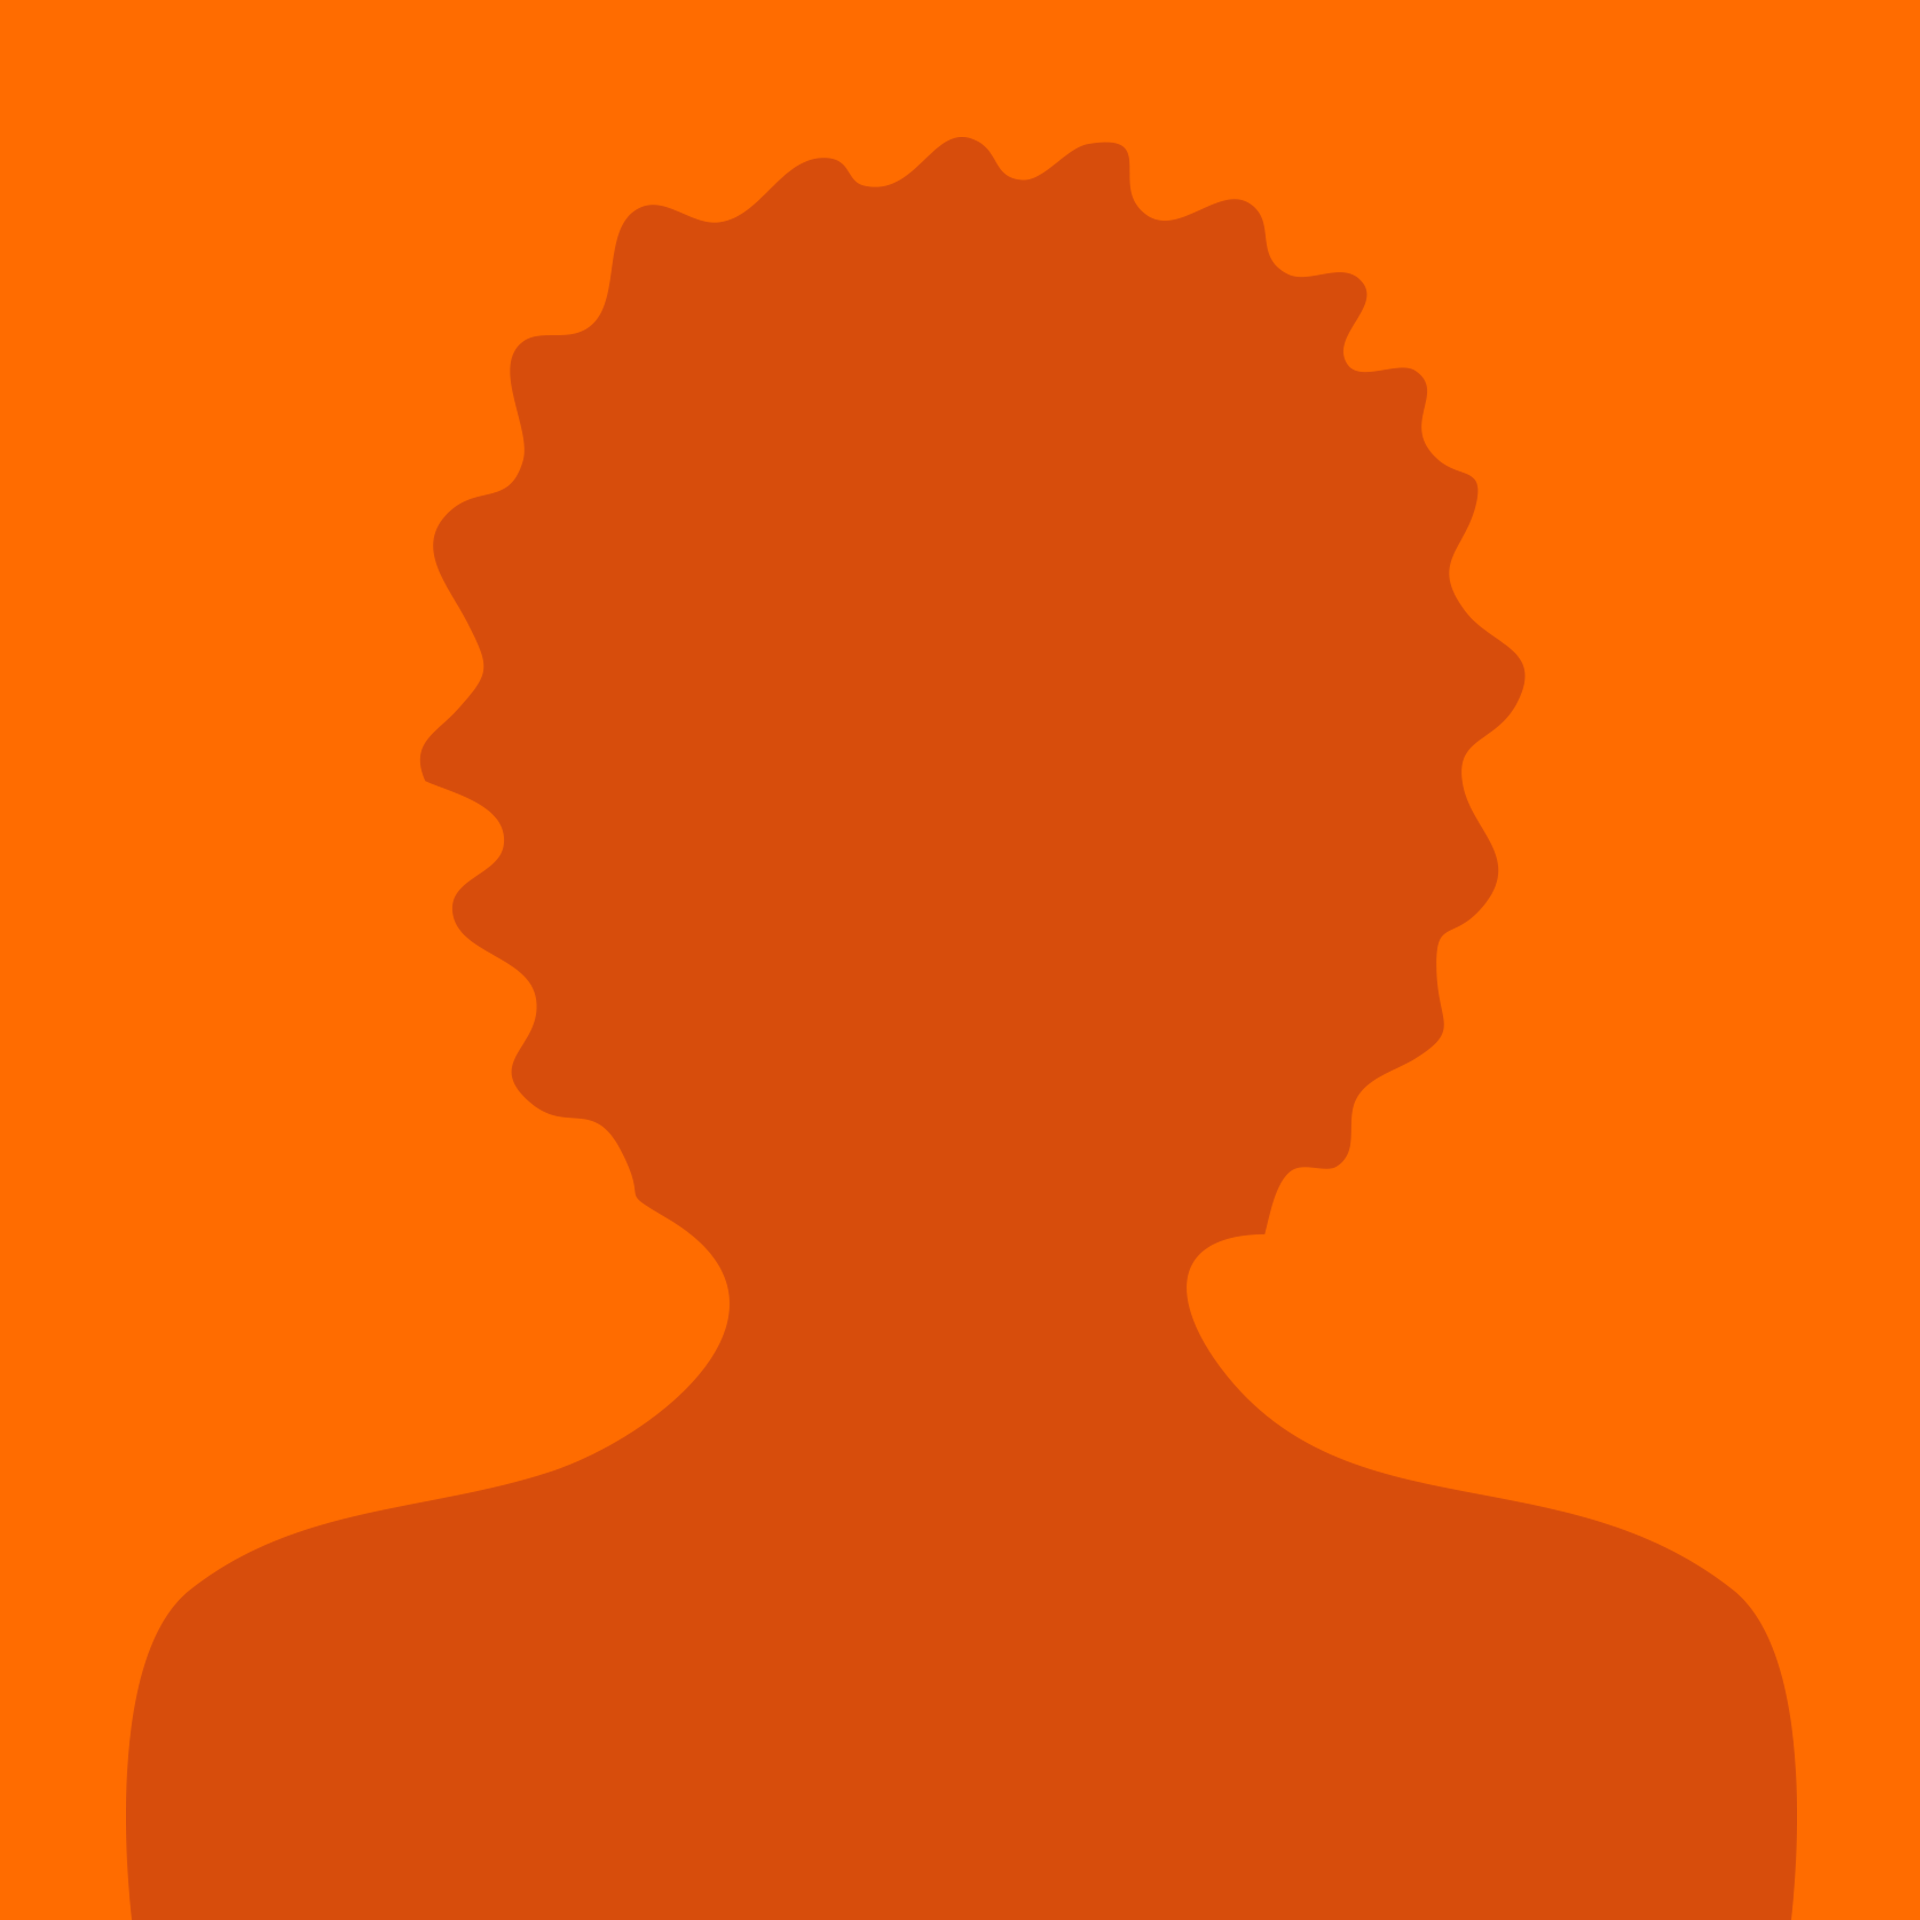 EH_employee_orange.png